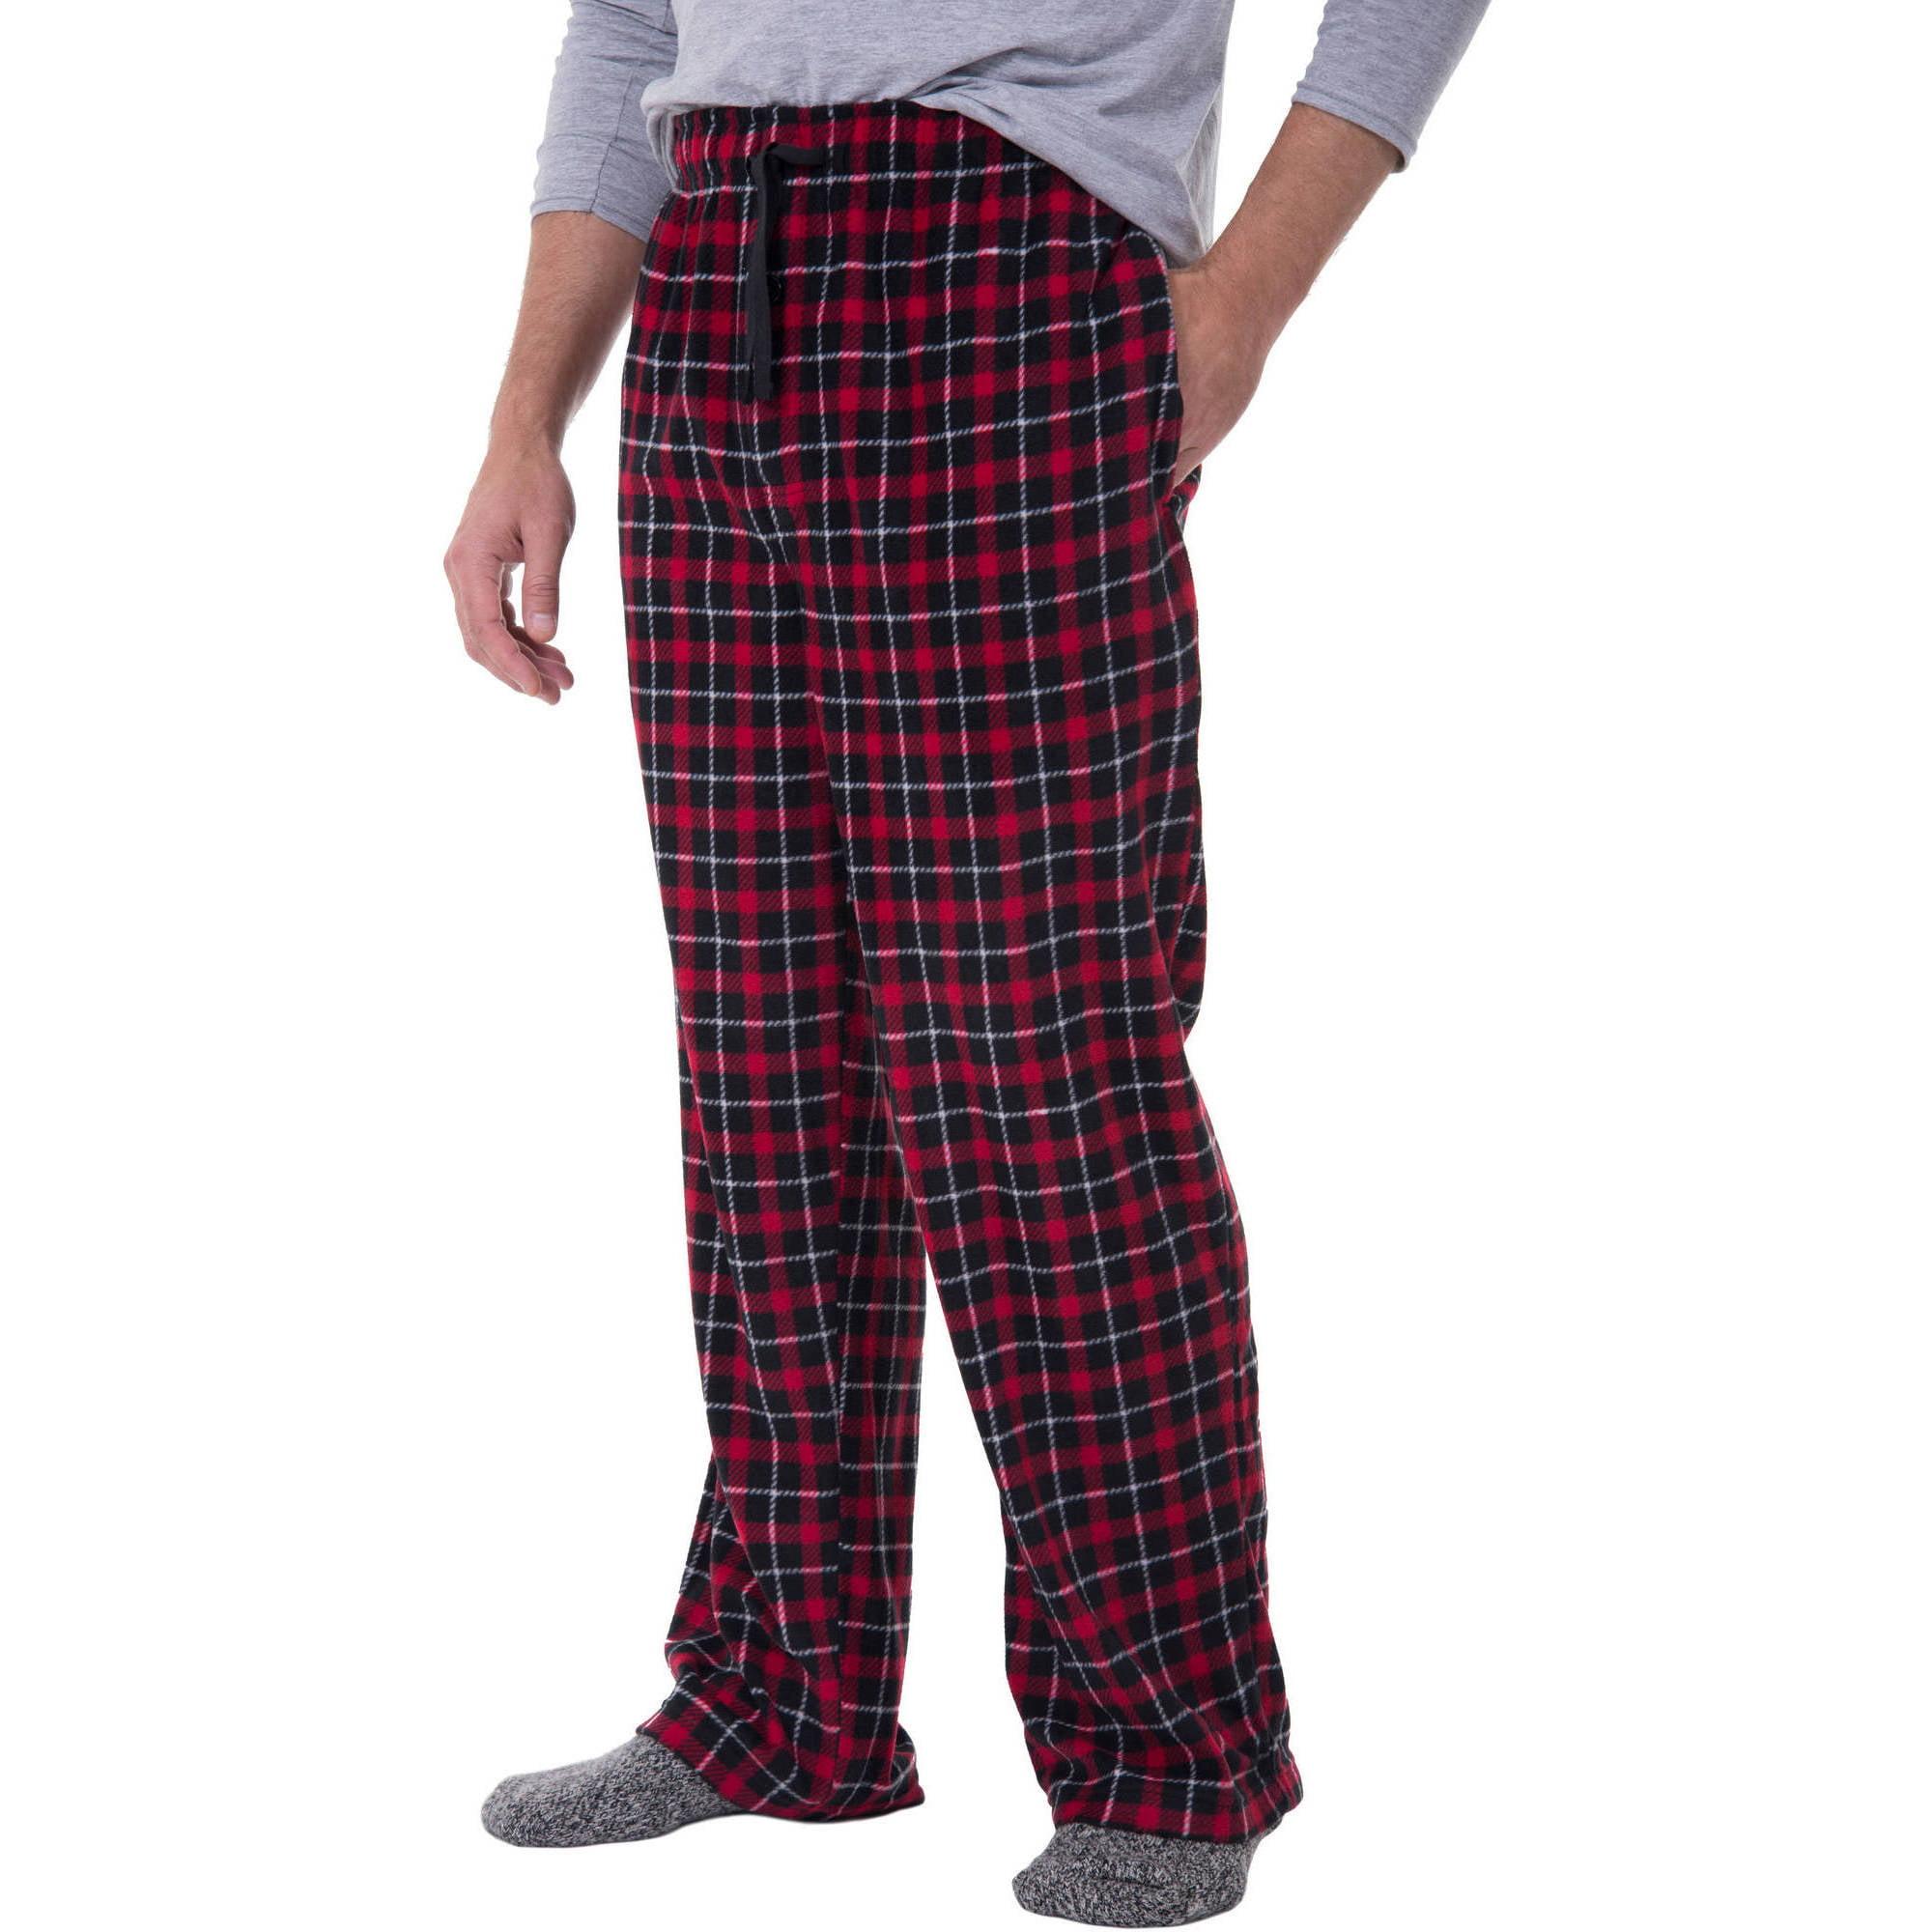 bec30f1add Fruit of the Loom - Men s Flannel Sleep Pant - Walmart.com